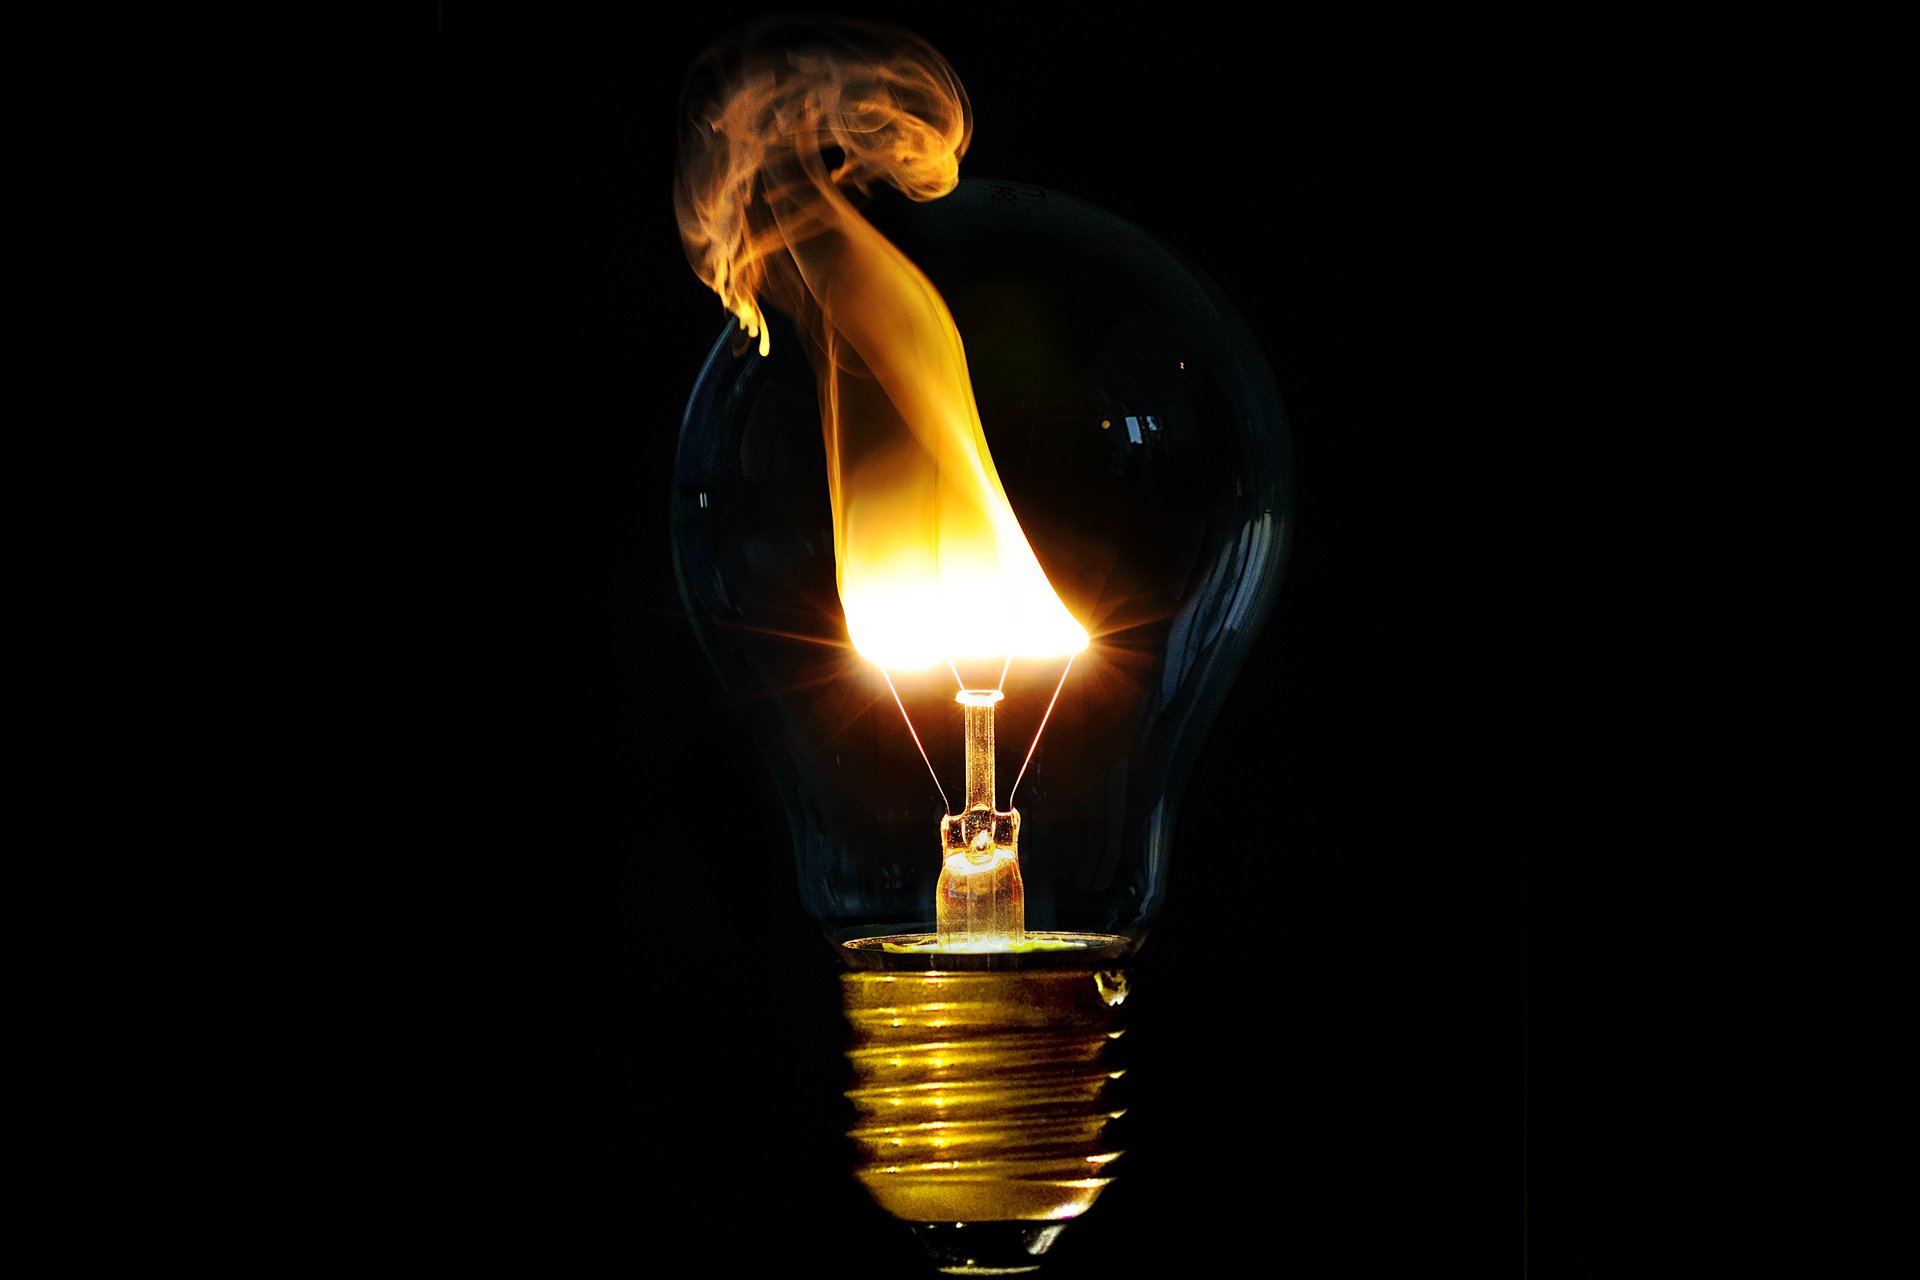 Wallpaper Incandescent light bulb fire simple desktop wallpaper 1920x1280